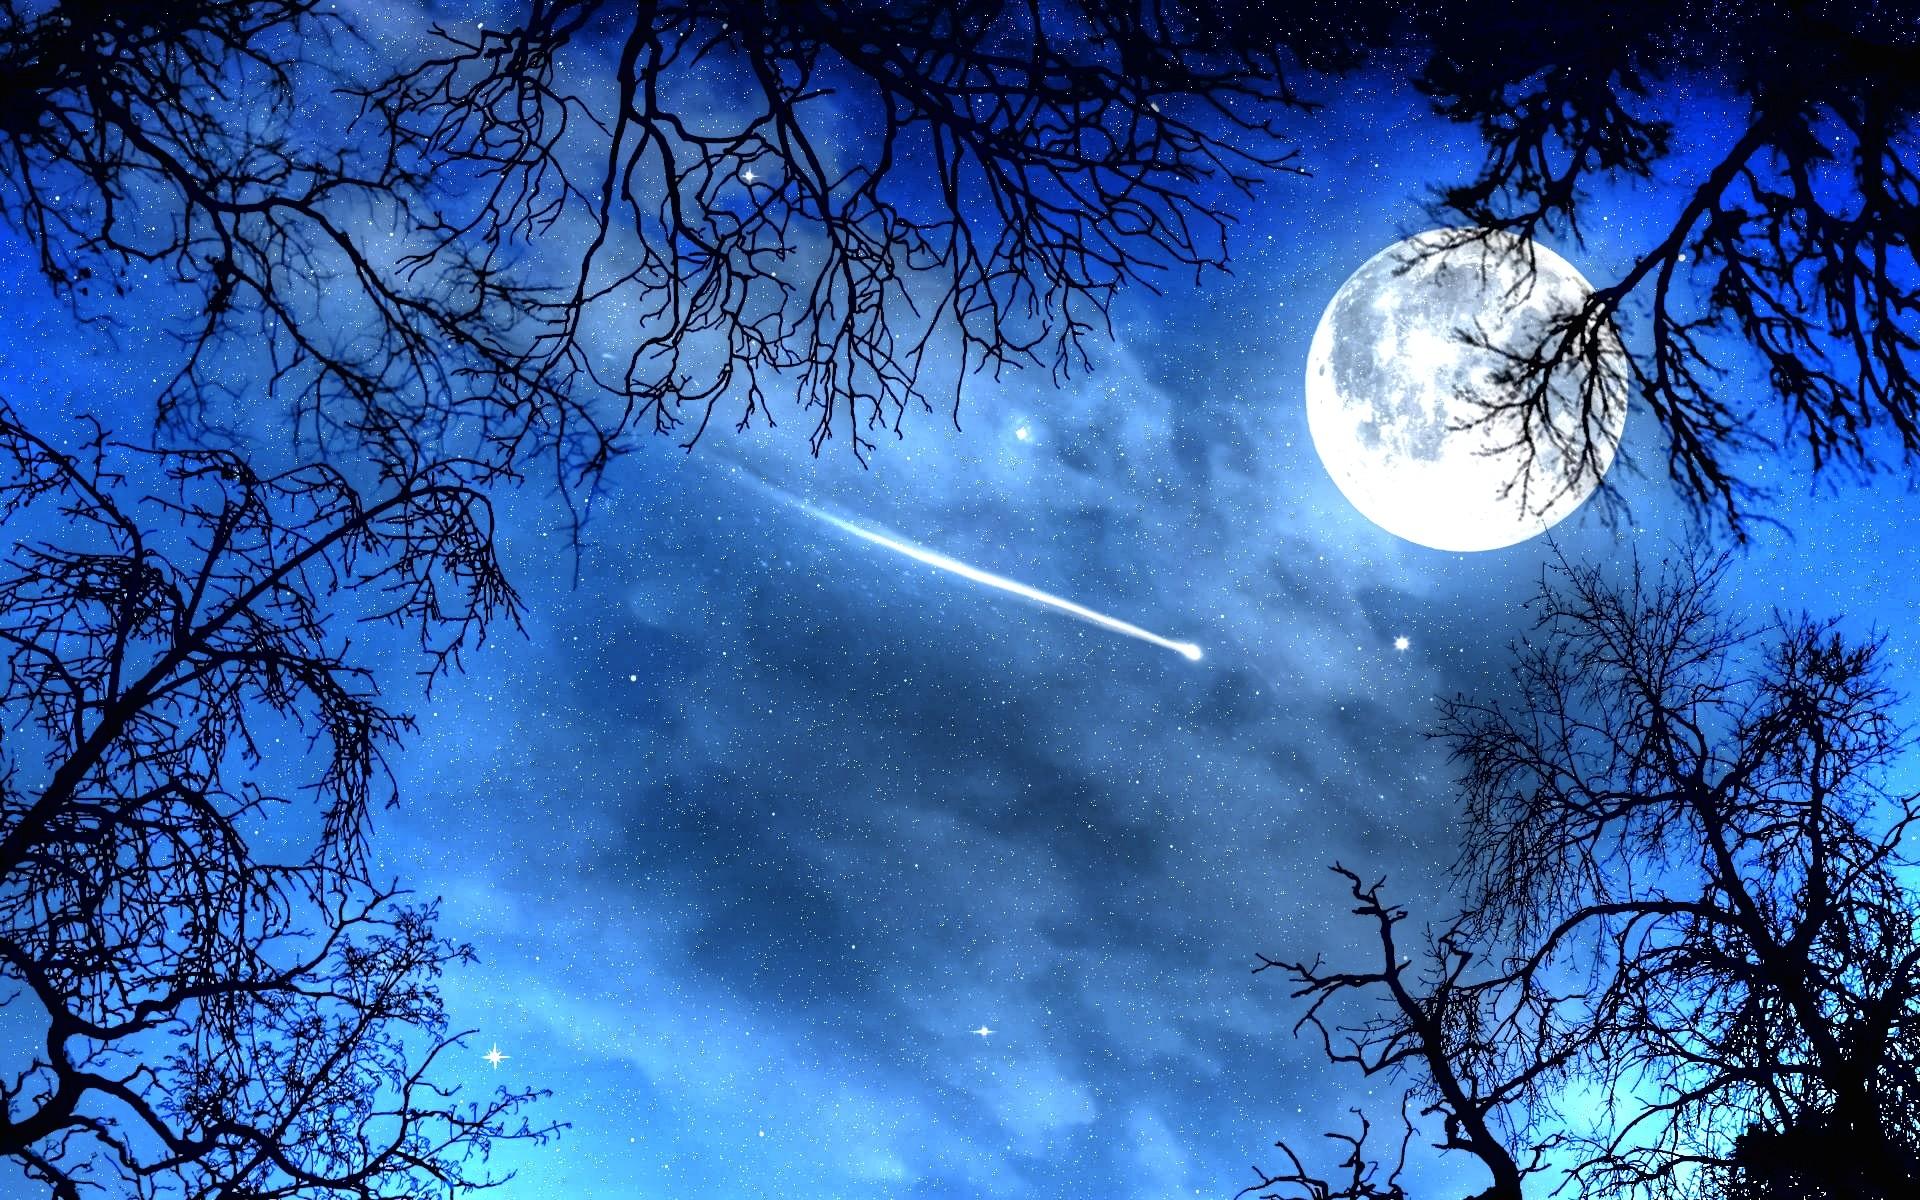 Wallpapers Starry Night Sky 1600 X 900 261 Kb Jpeg | HD Wallpapers .